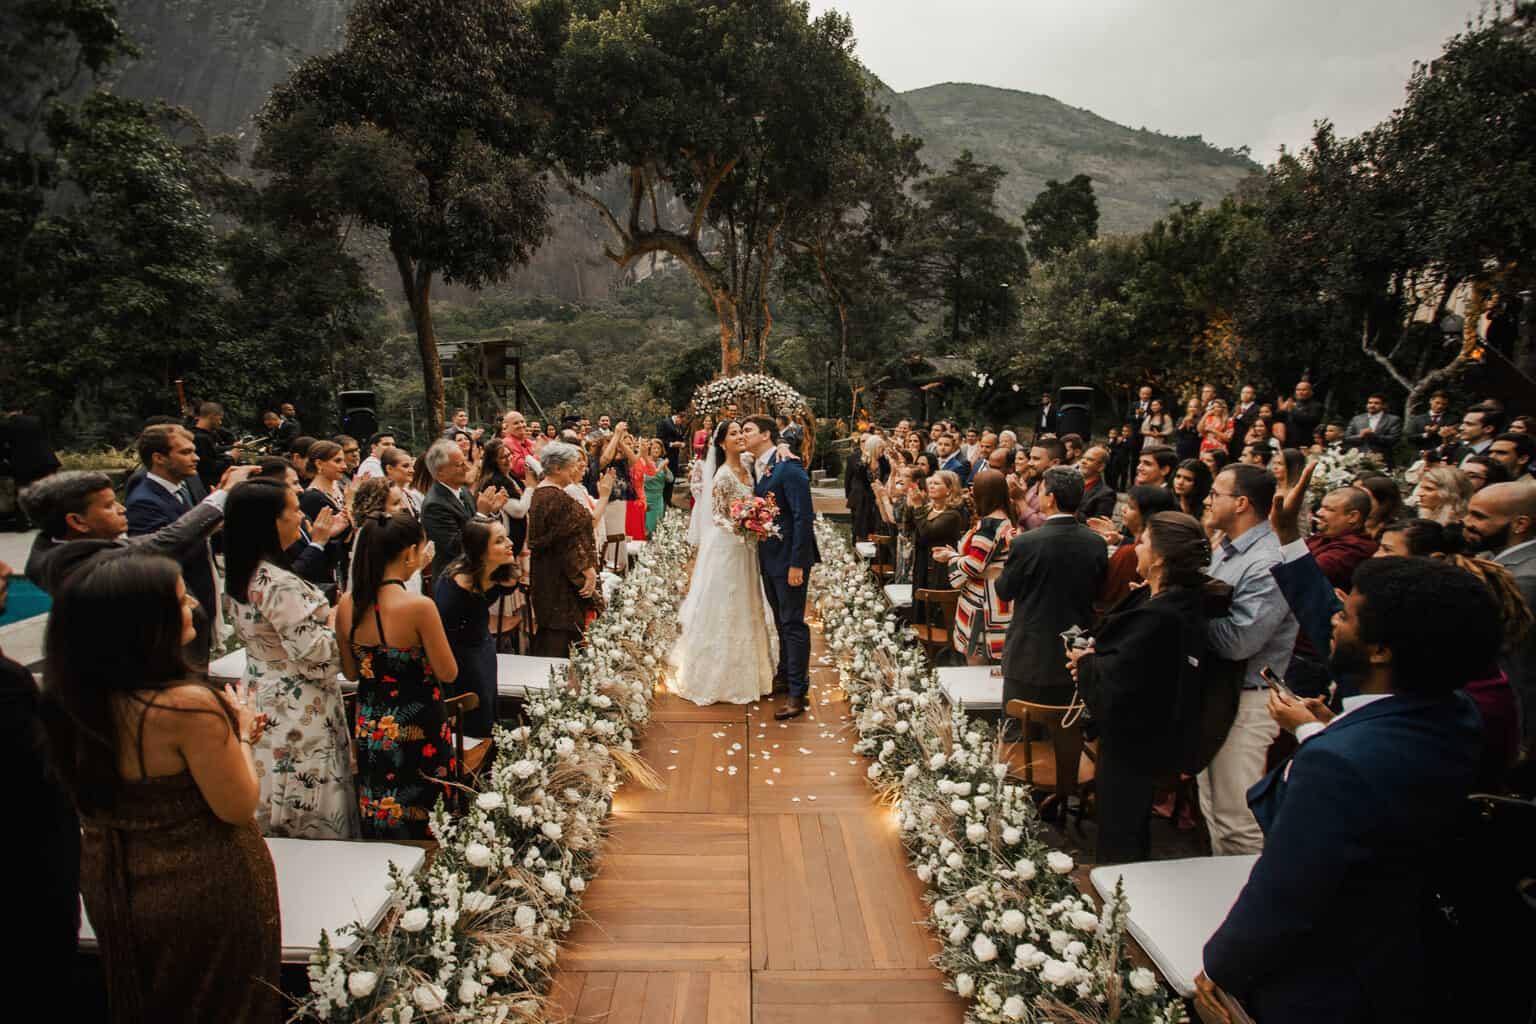 casamento-Beatriz-e-Joao-Fernando-cerimonia-ao-ar-livre-Itaipava-Locanda-Della-Mimosa-Thienny-Tammis177